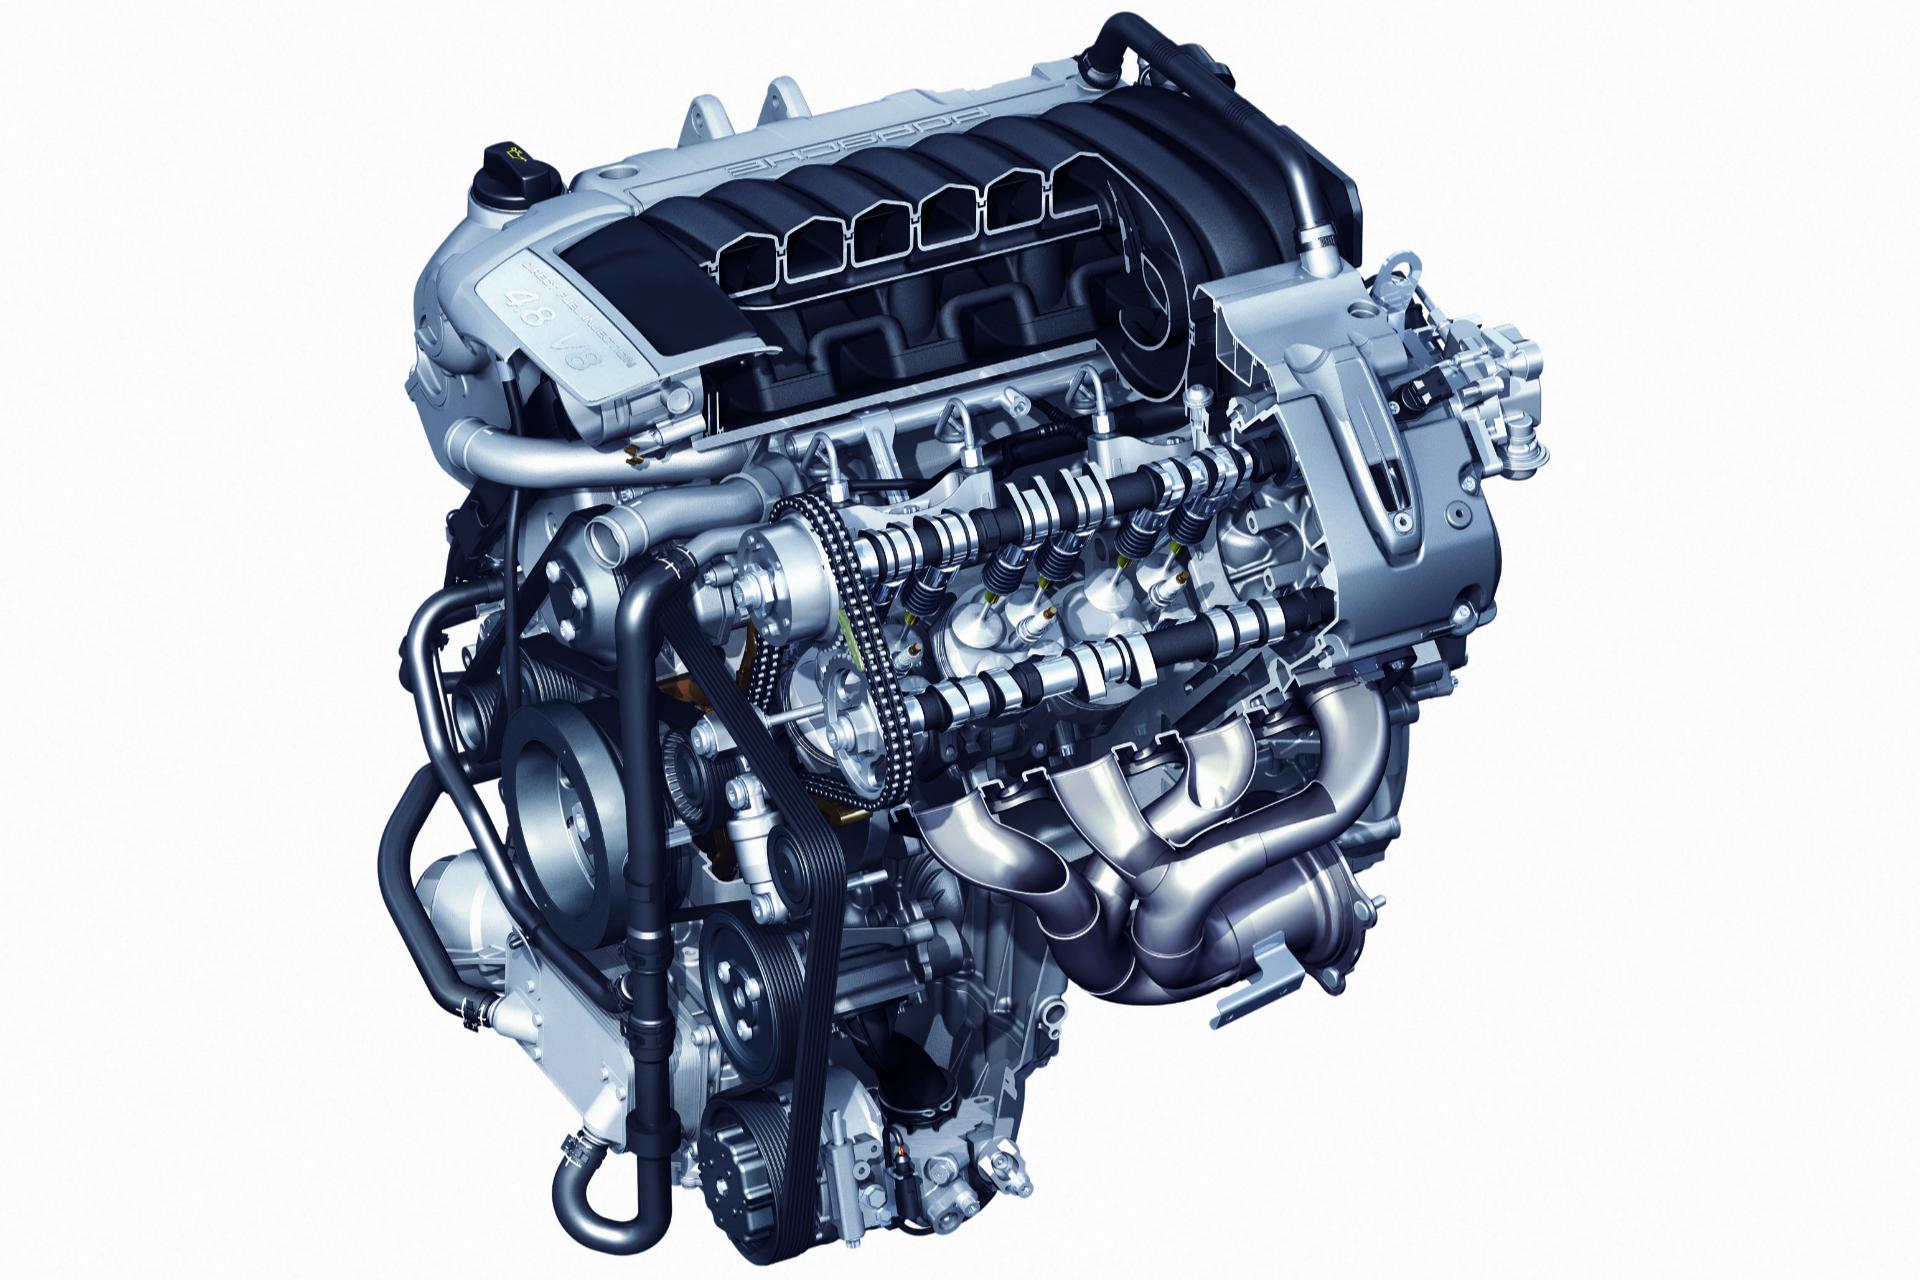 Kaufberatung Porsche Cayenne Motor